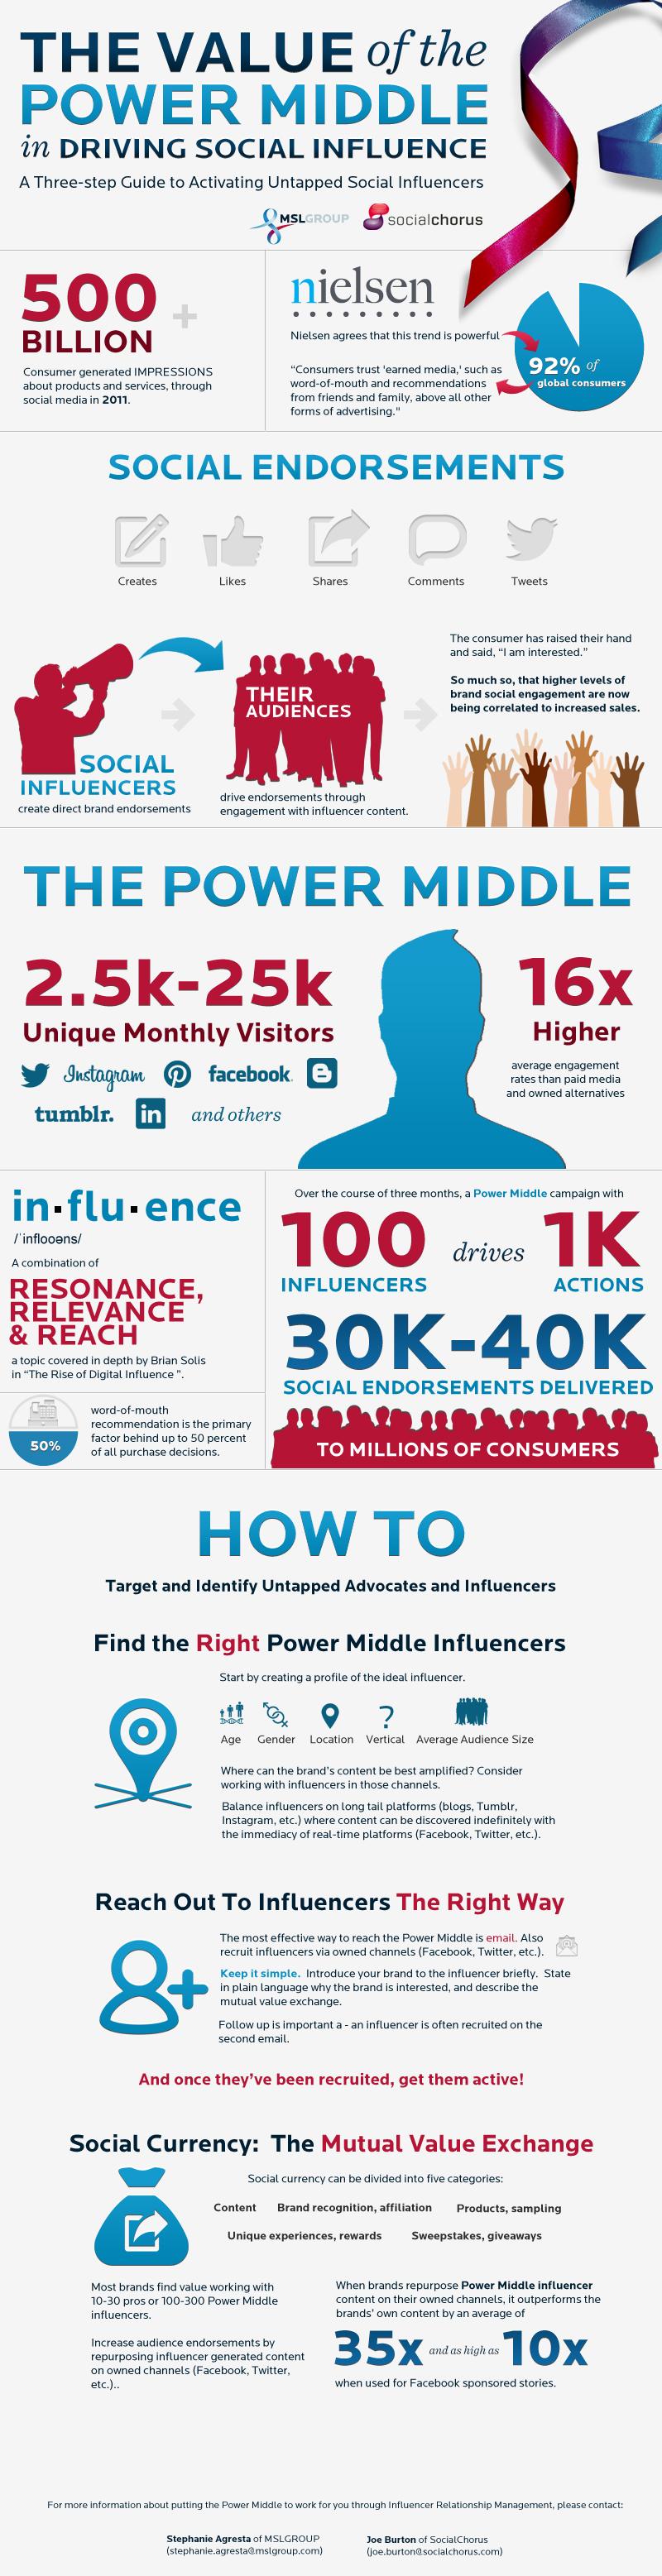 Guía para encontrar influencers adecuados